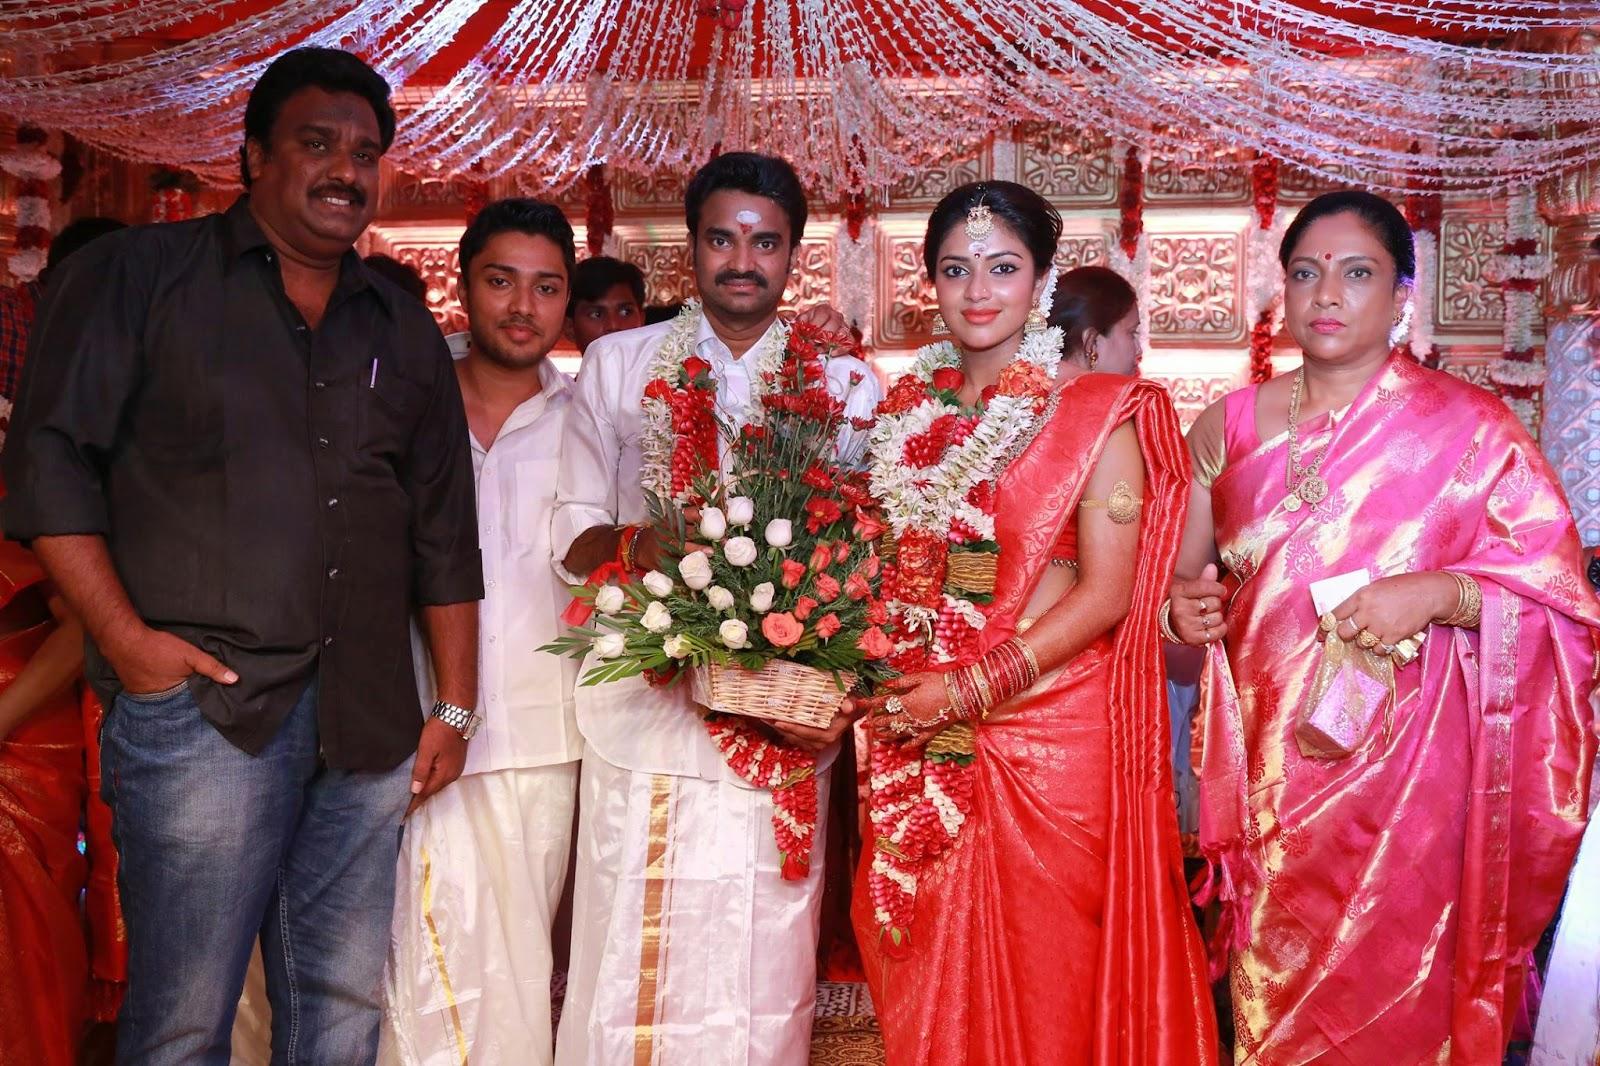 Amala Paul Al Vijay wedding Photos gallery-HQ-Photo-14